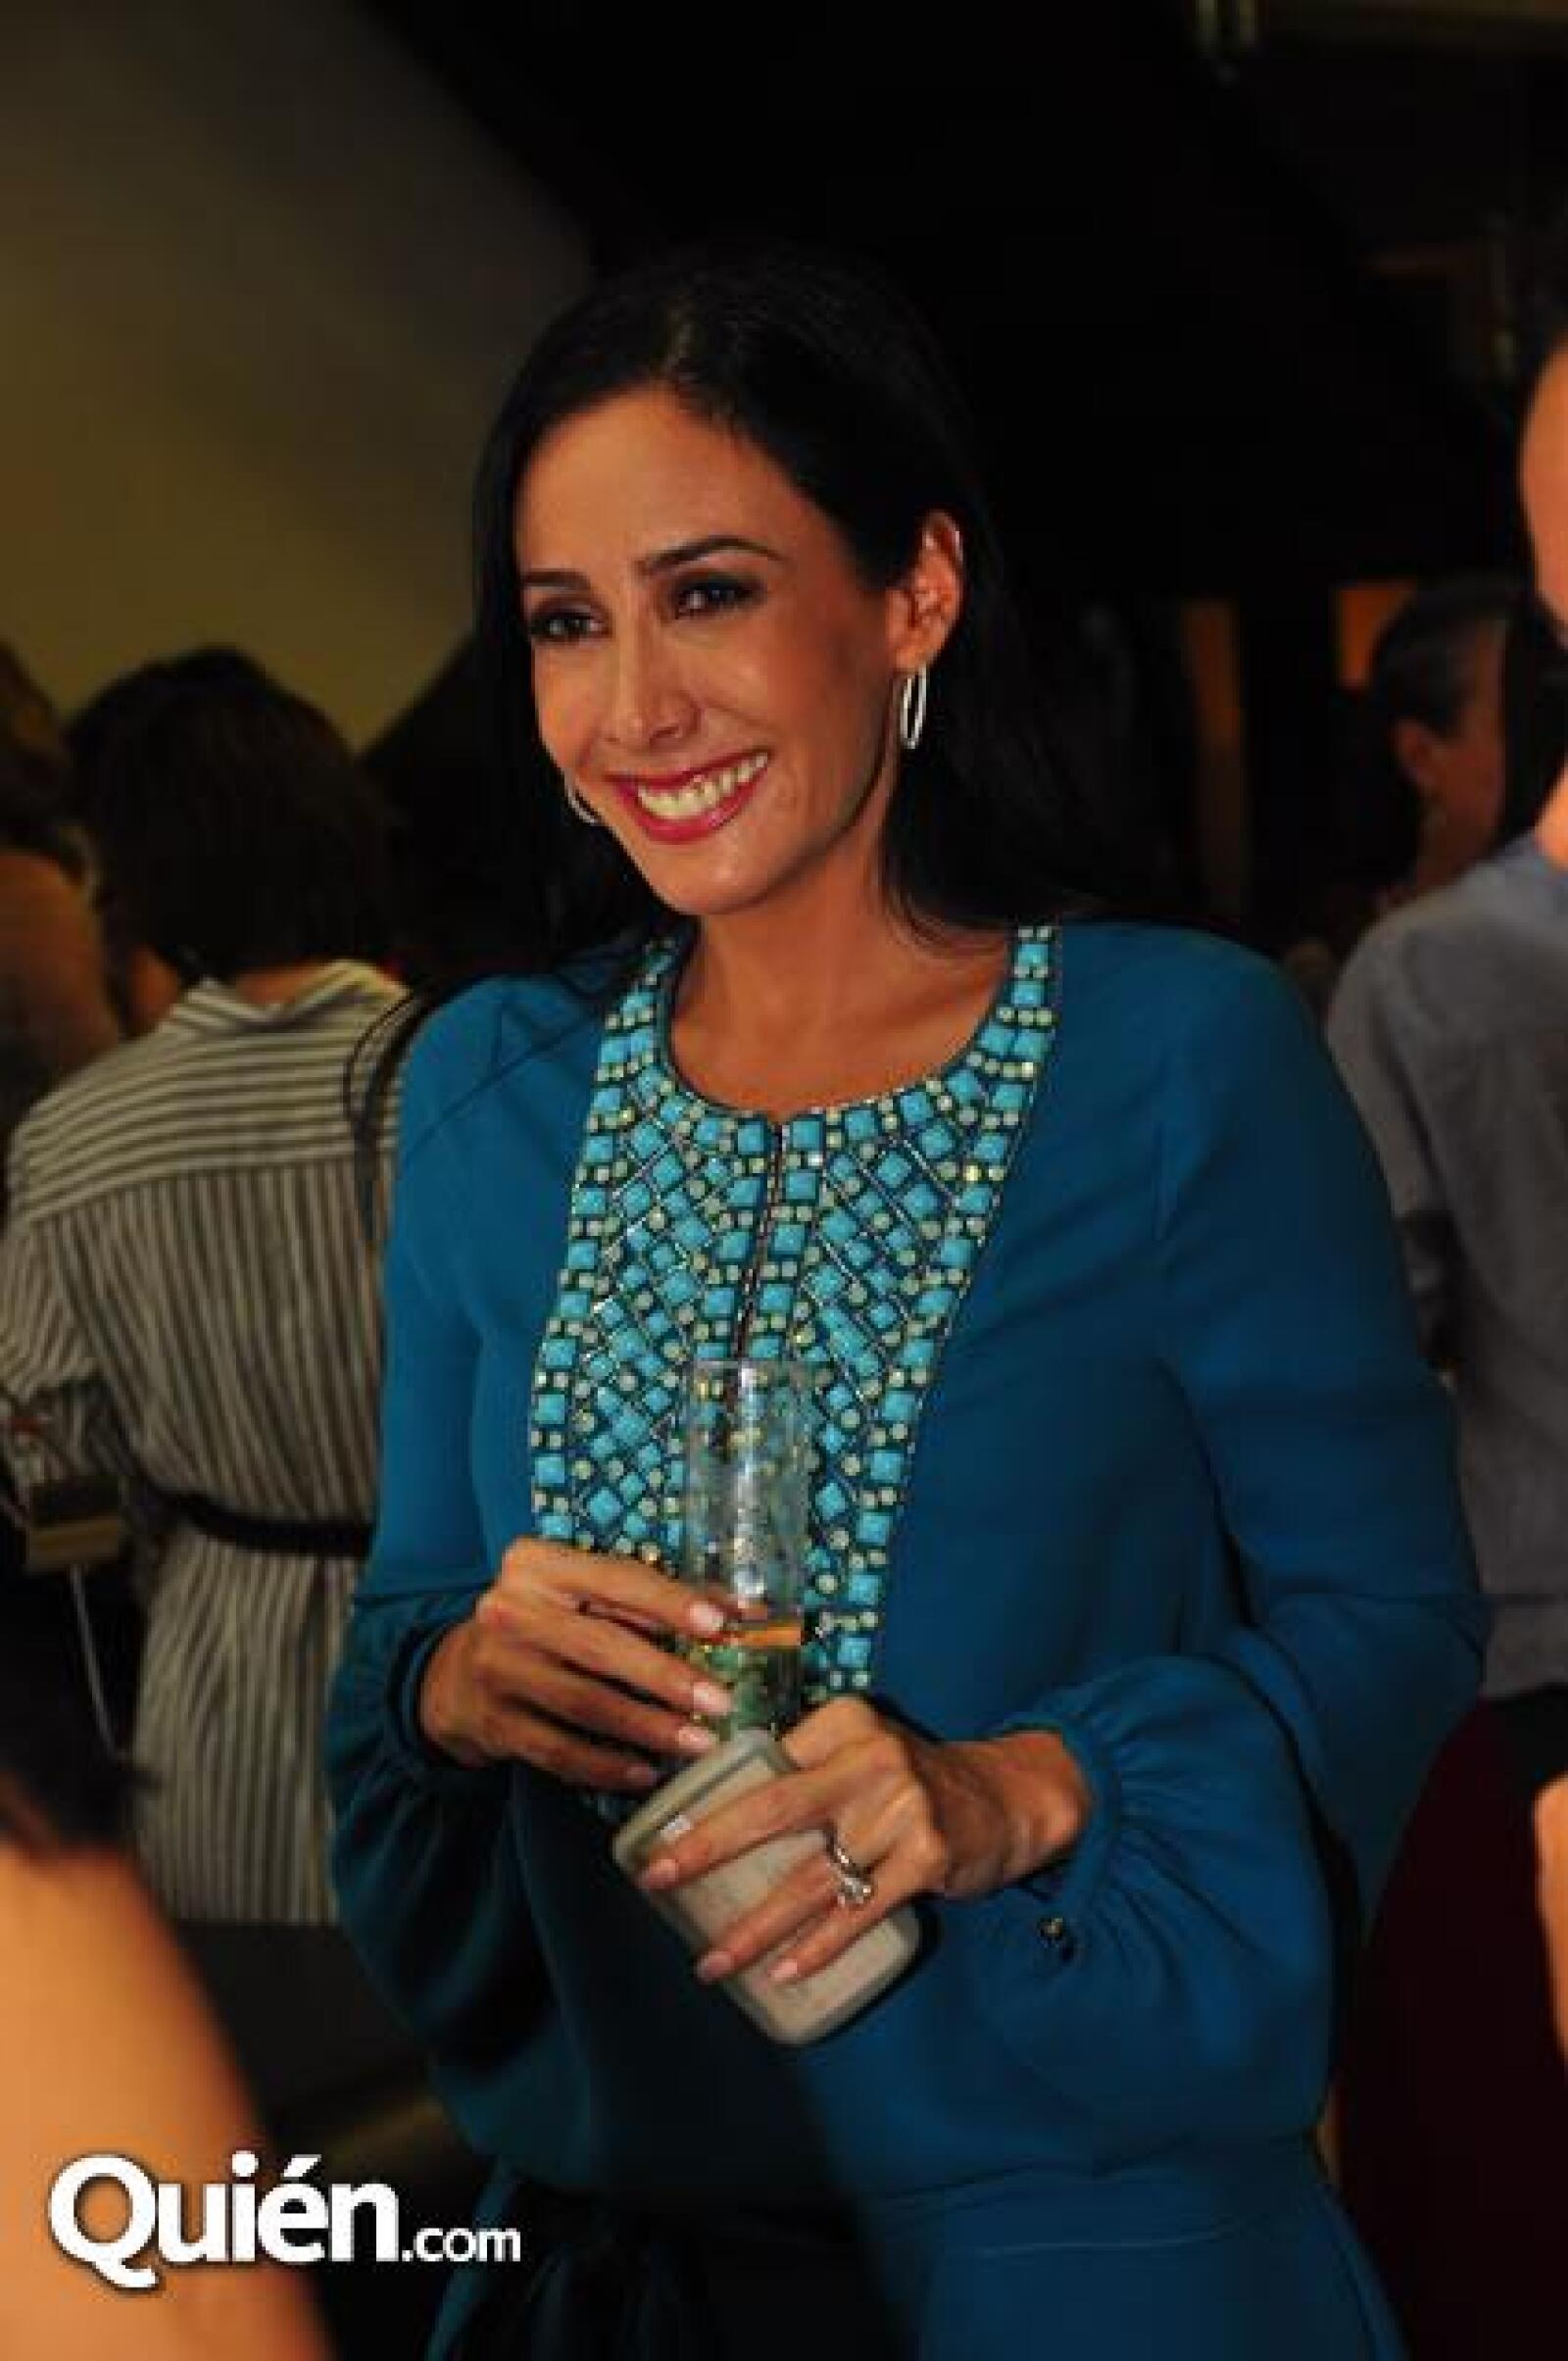 Maria Laura Medina de Salinas Pliego